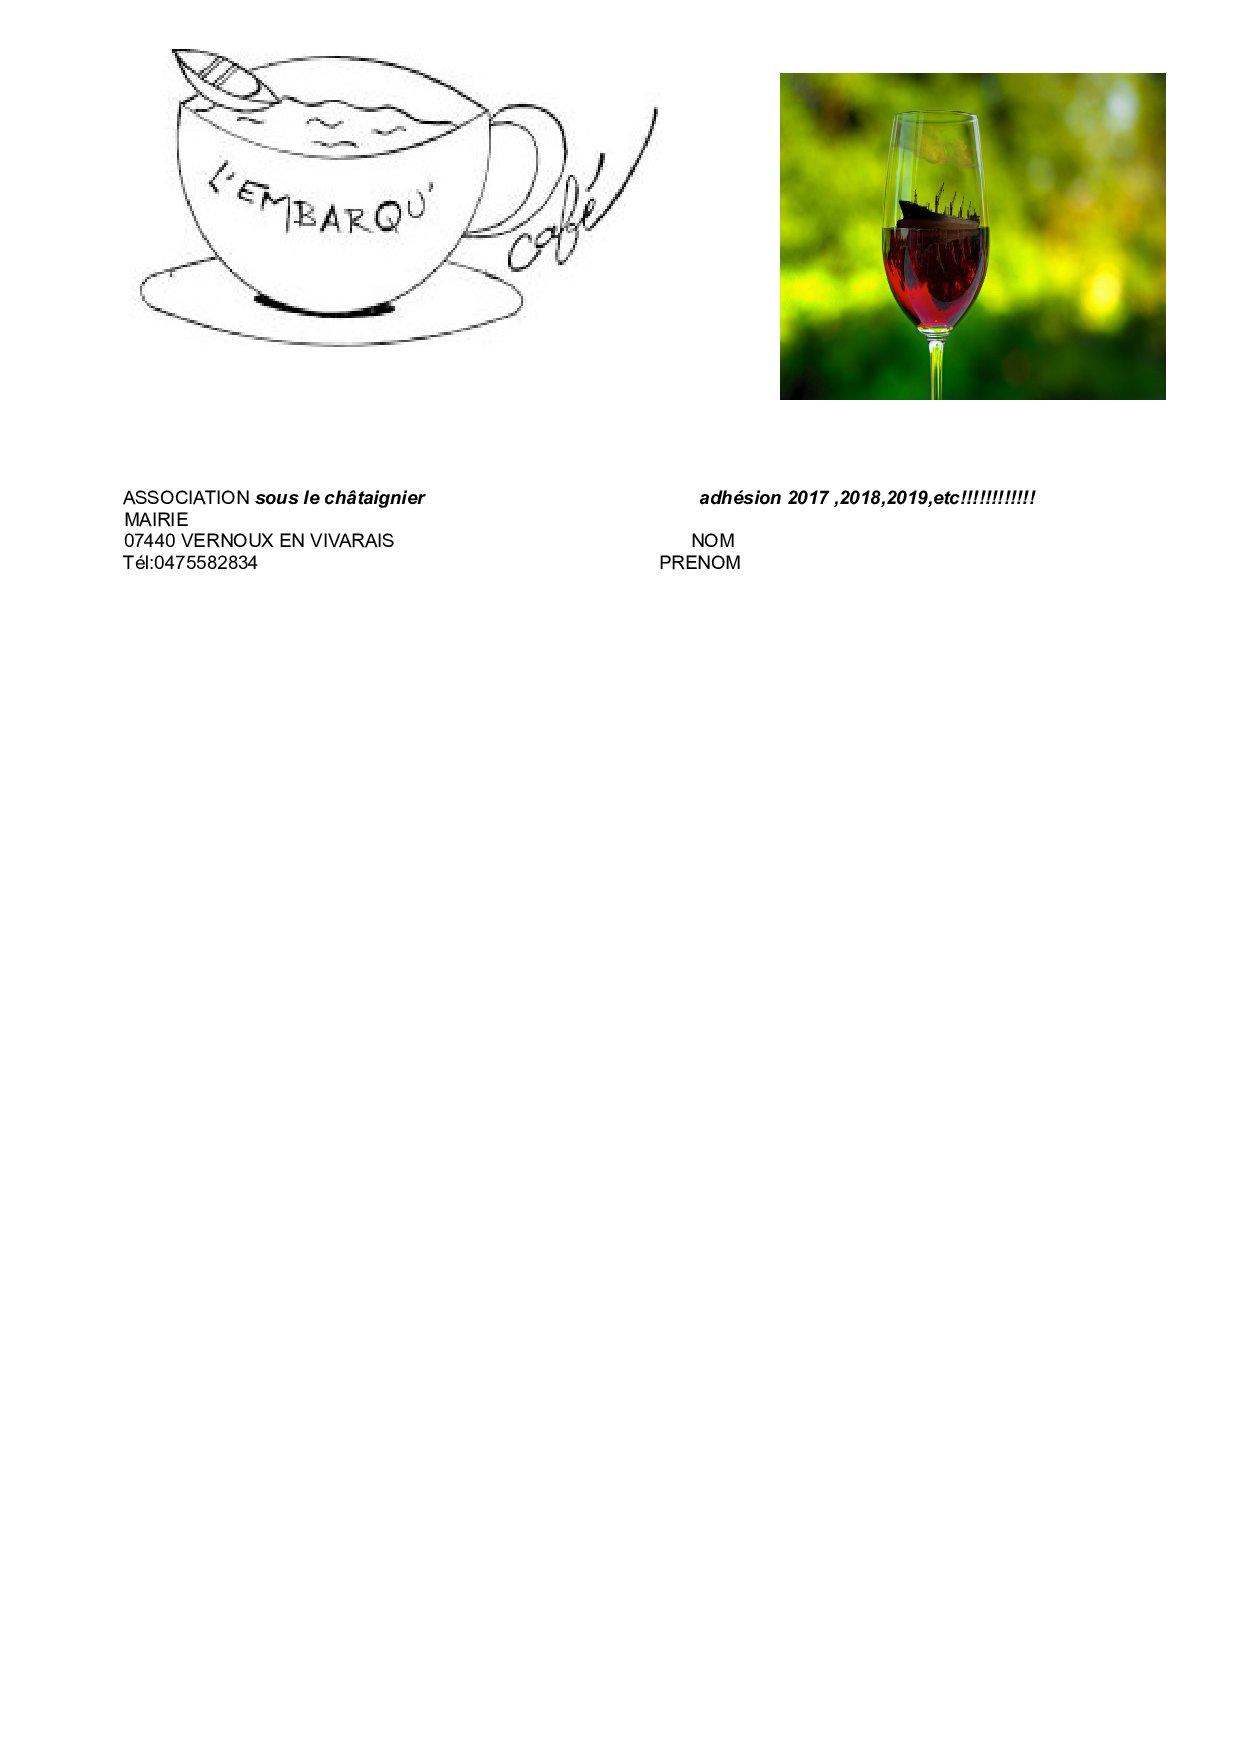 contrep3-1475664584.jpg